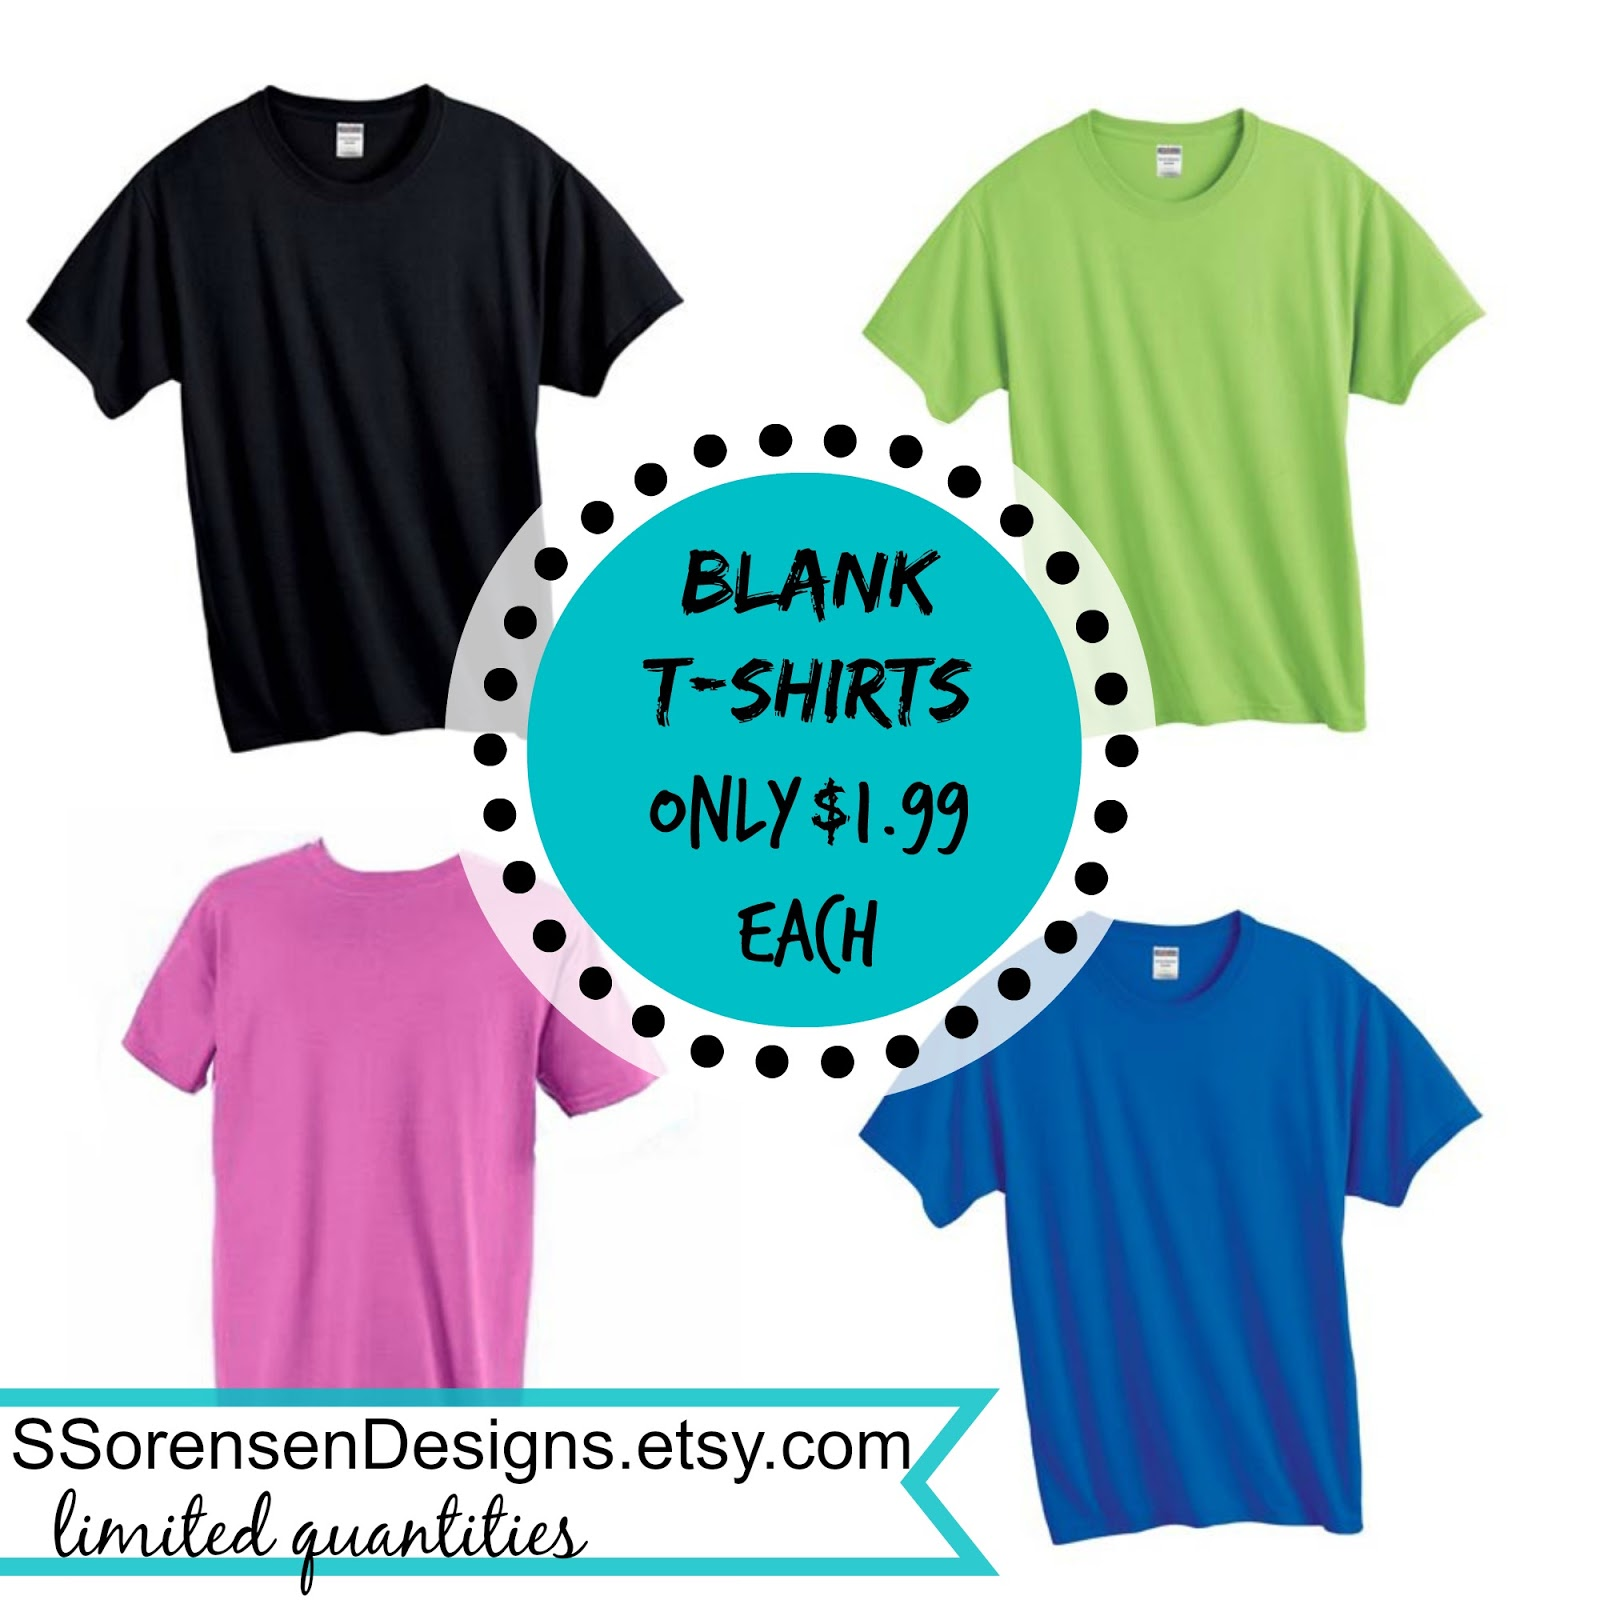 7618bbe8262 sale plain t-shirts mens womens black blue green